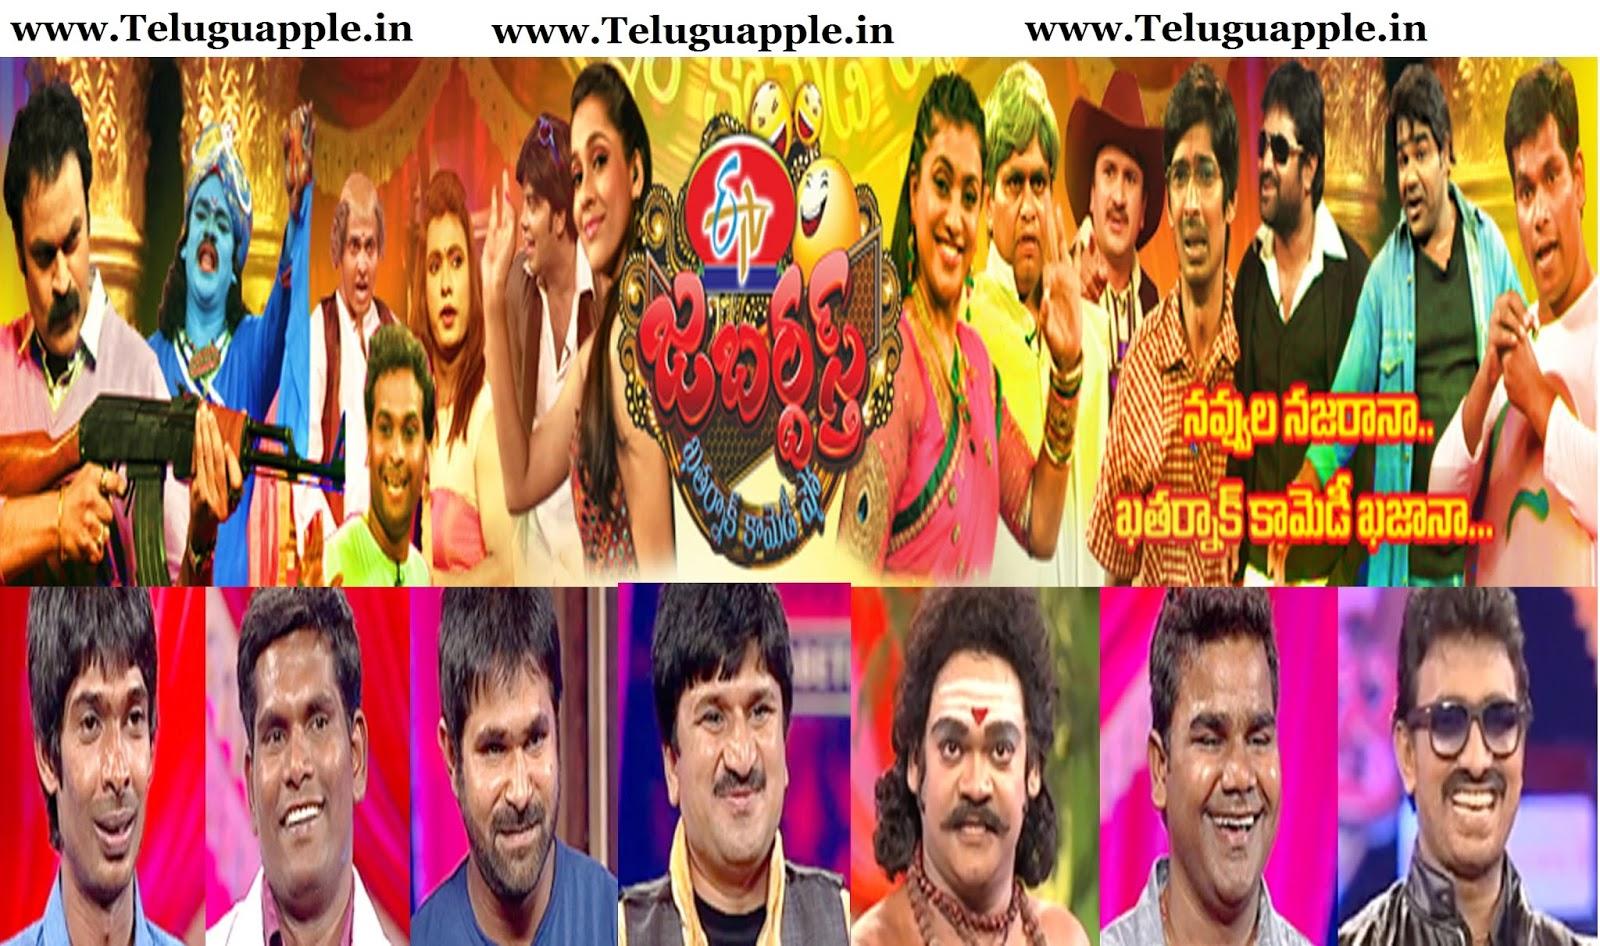 Jabardasth (comedy show) Names & Teams List ~ Telugu Apple News